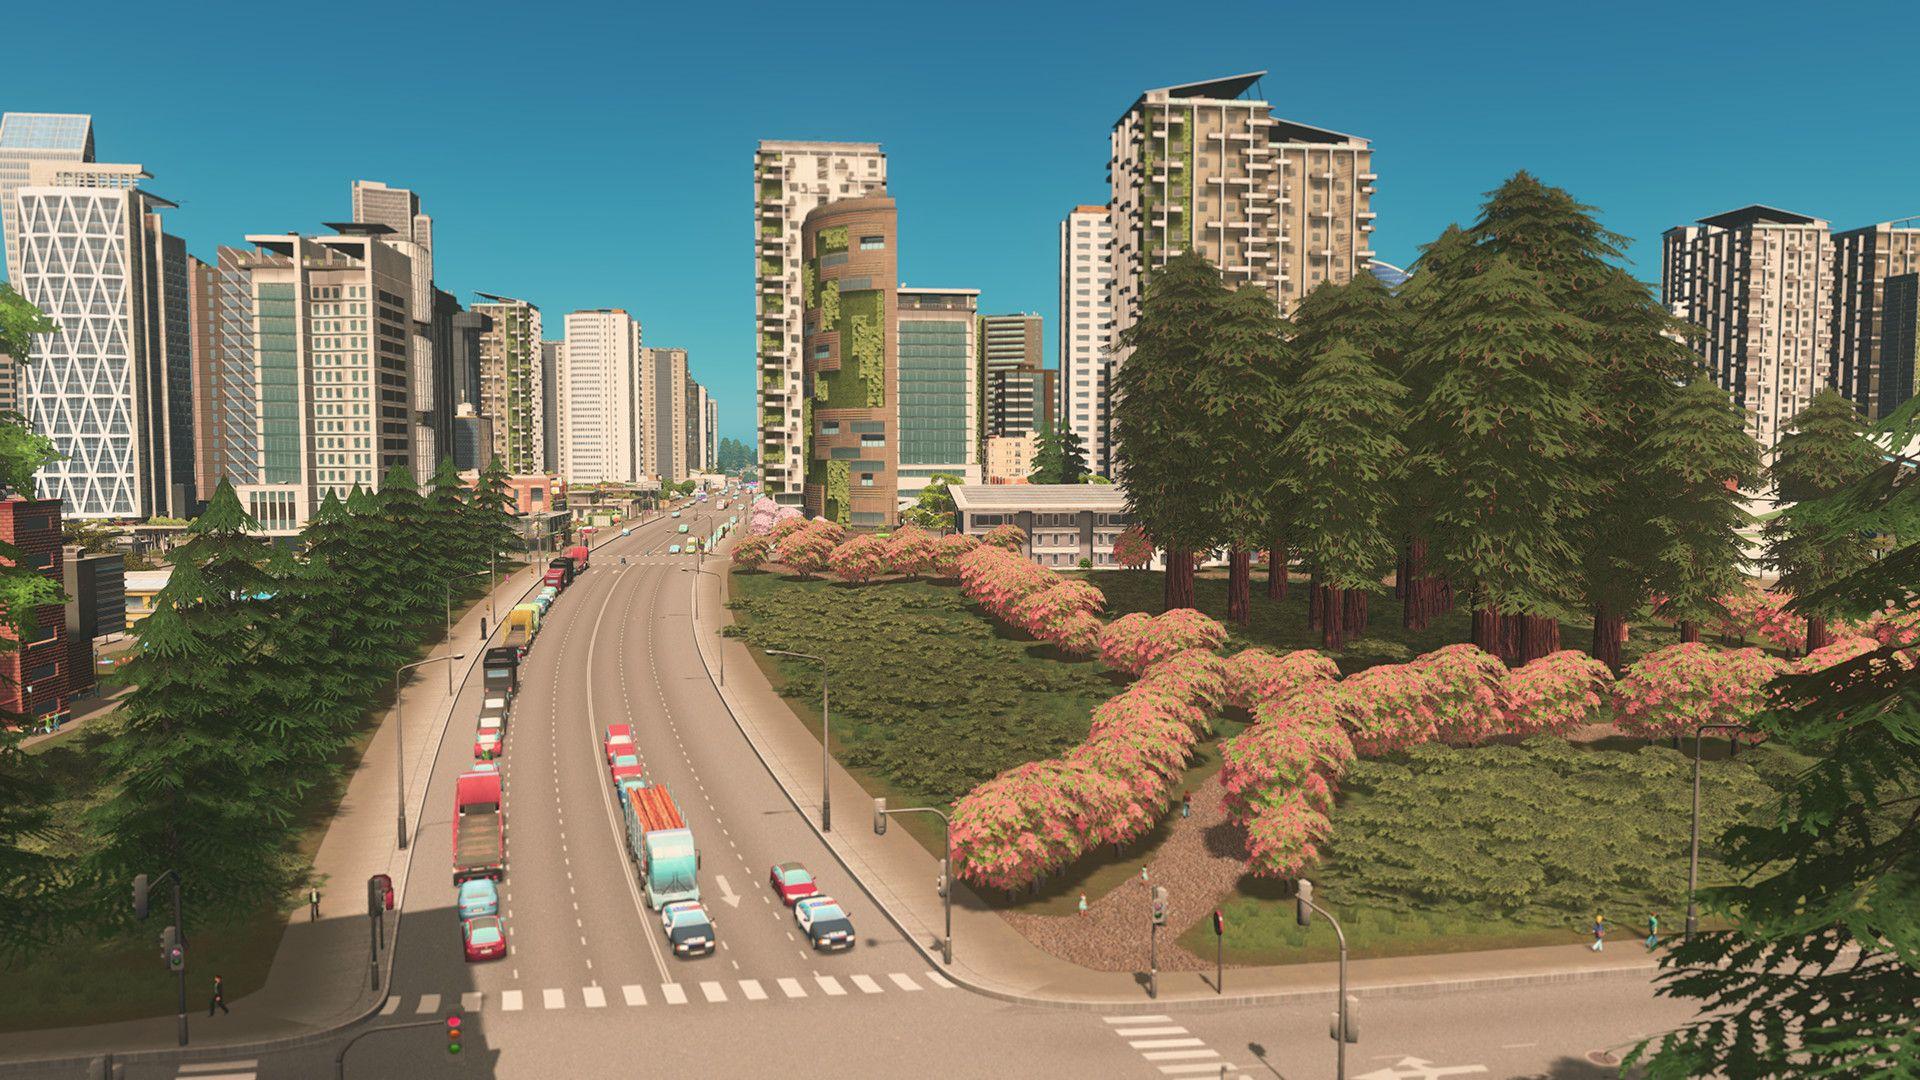 CITIESGREENCITIES2.jpg